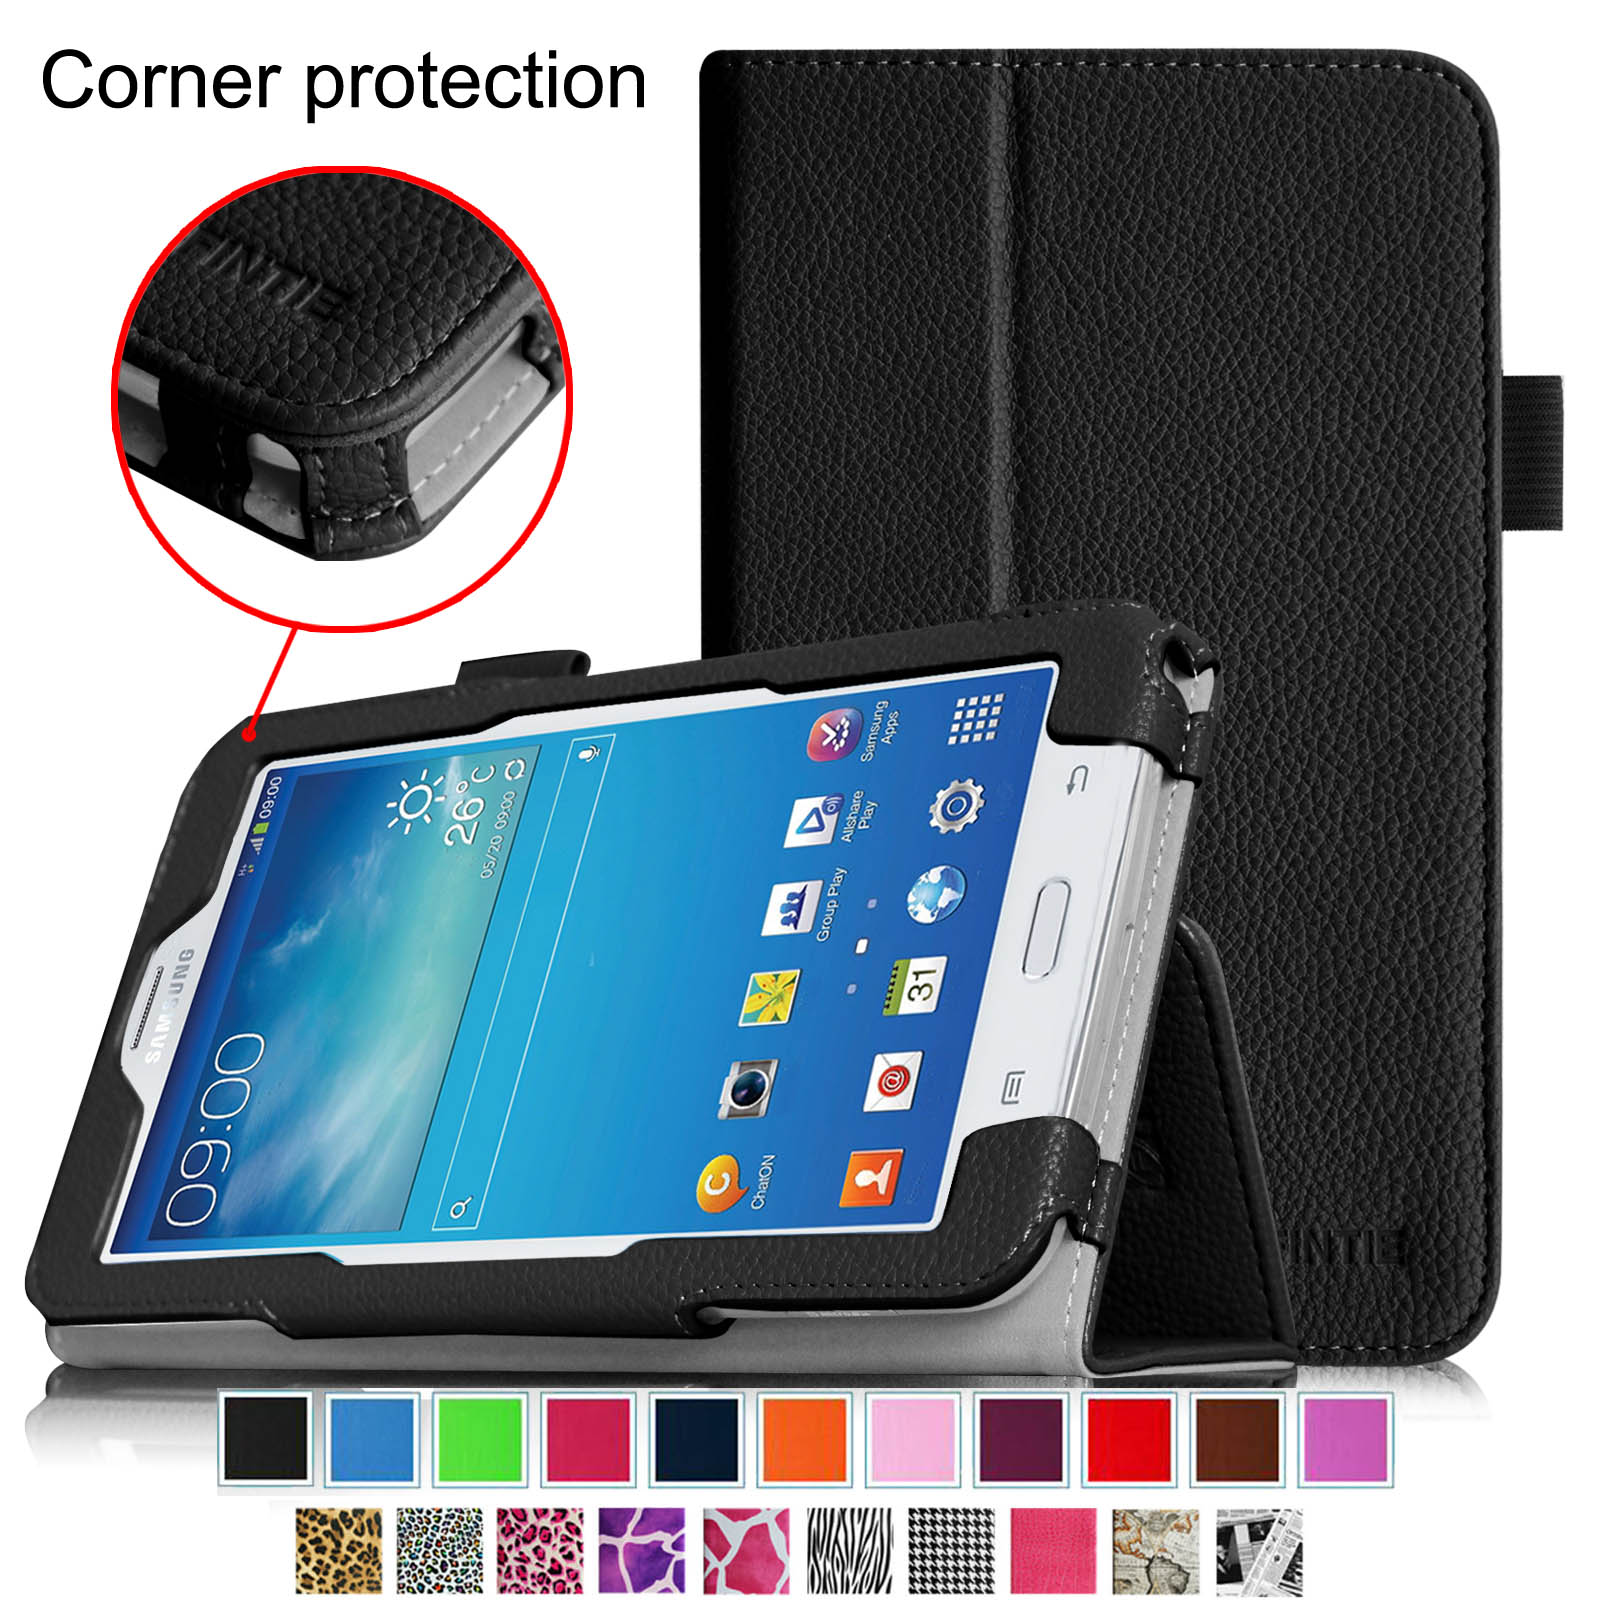 Fintie Folio Case for Samsung Galaxy Tab E Lite 7.0 SM-T113 / Tab 3 Lite 7.0 SM-T110 SM-T111 Tablet Stand Cover, Black